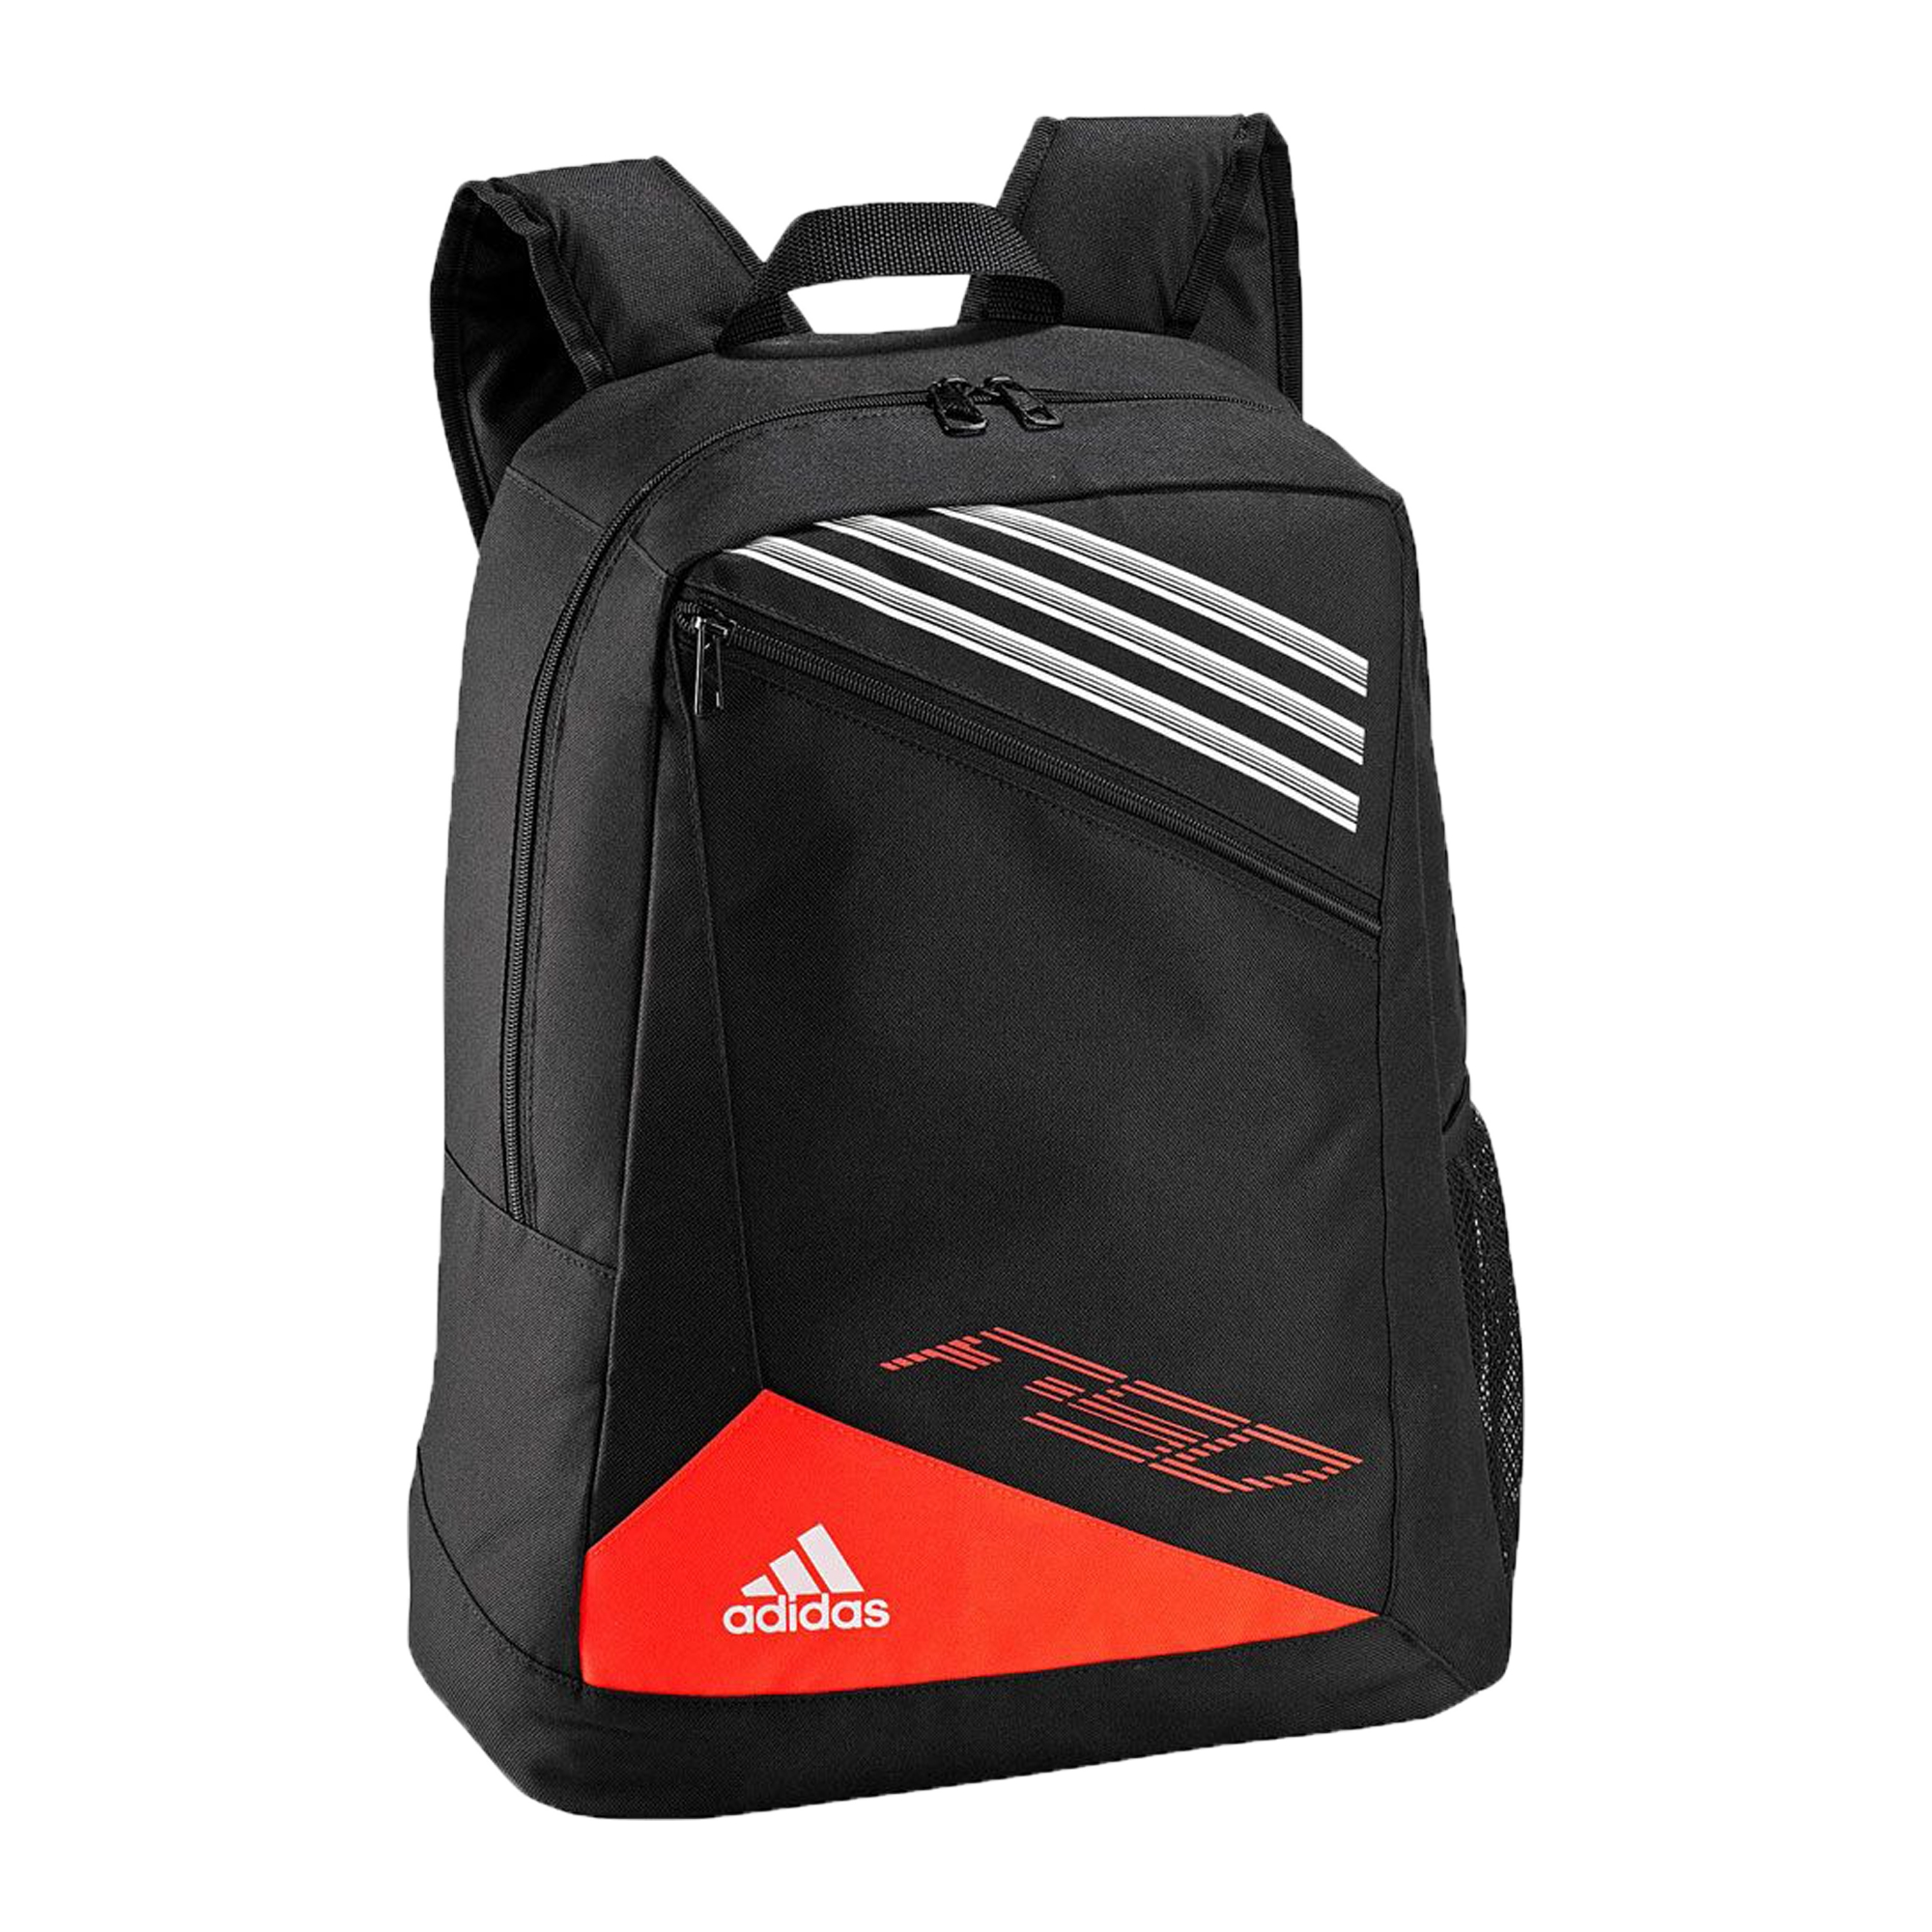 adidas F50 Backpack CO Sırt Çantası  G81645 - Barcin.com 01a88bb238d74